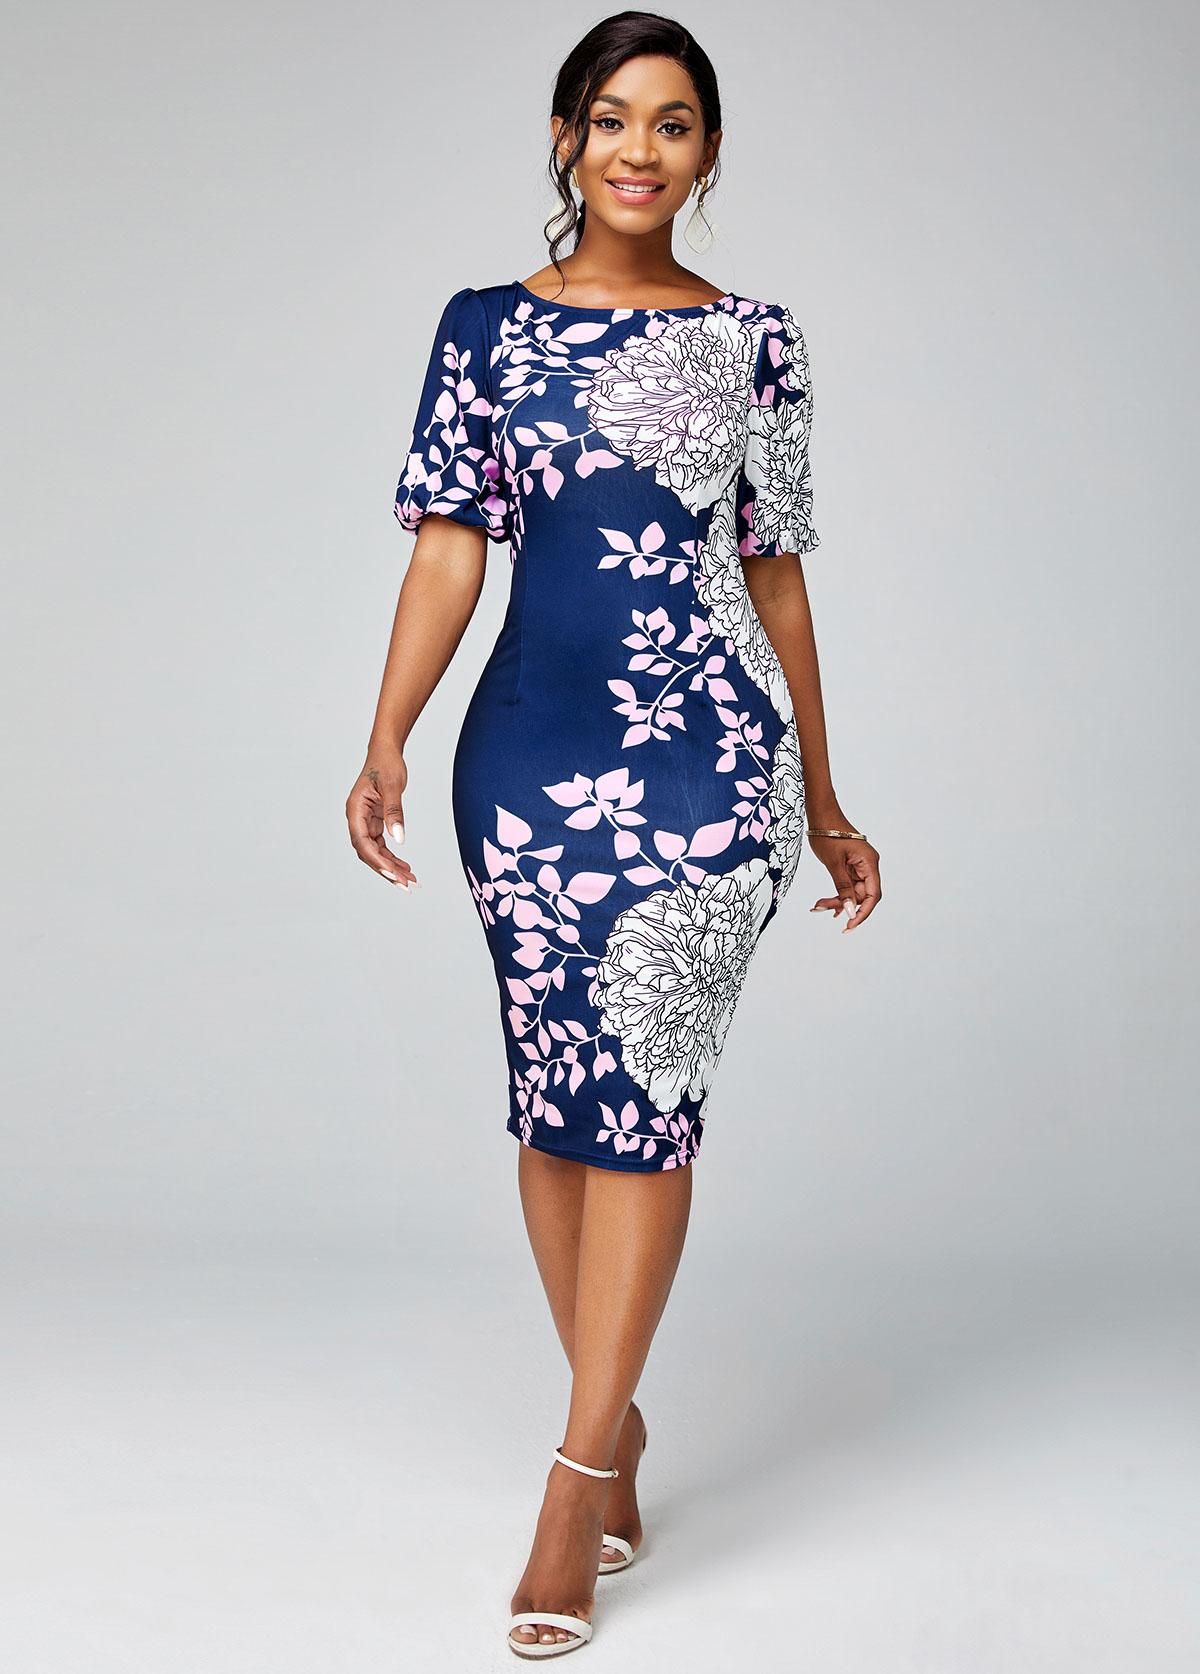 ROTITA Round Neck Floral Print Short Sleeve Bodycon Dress